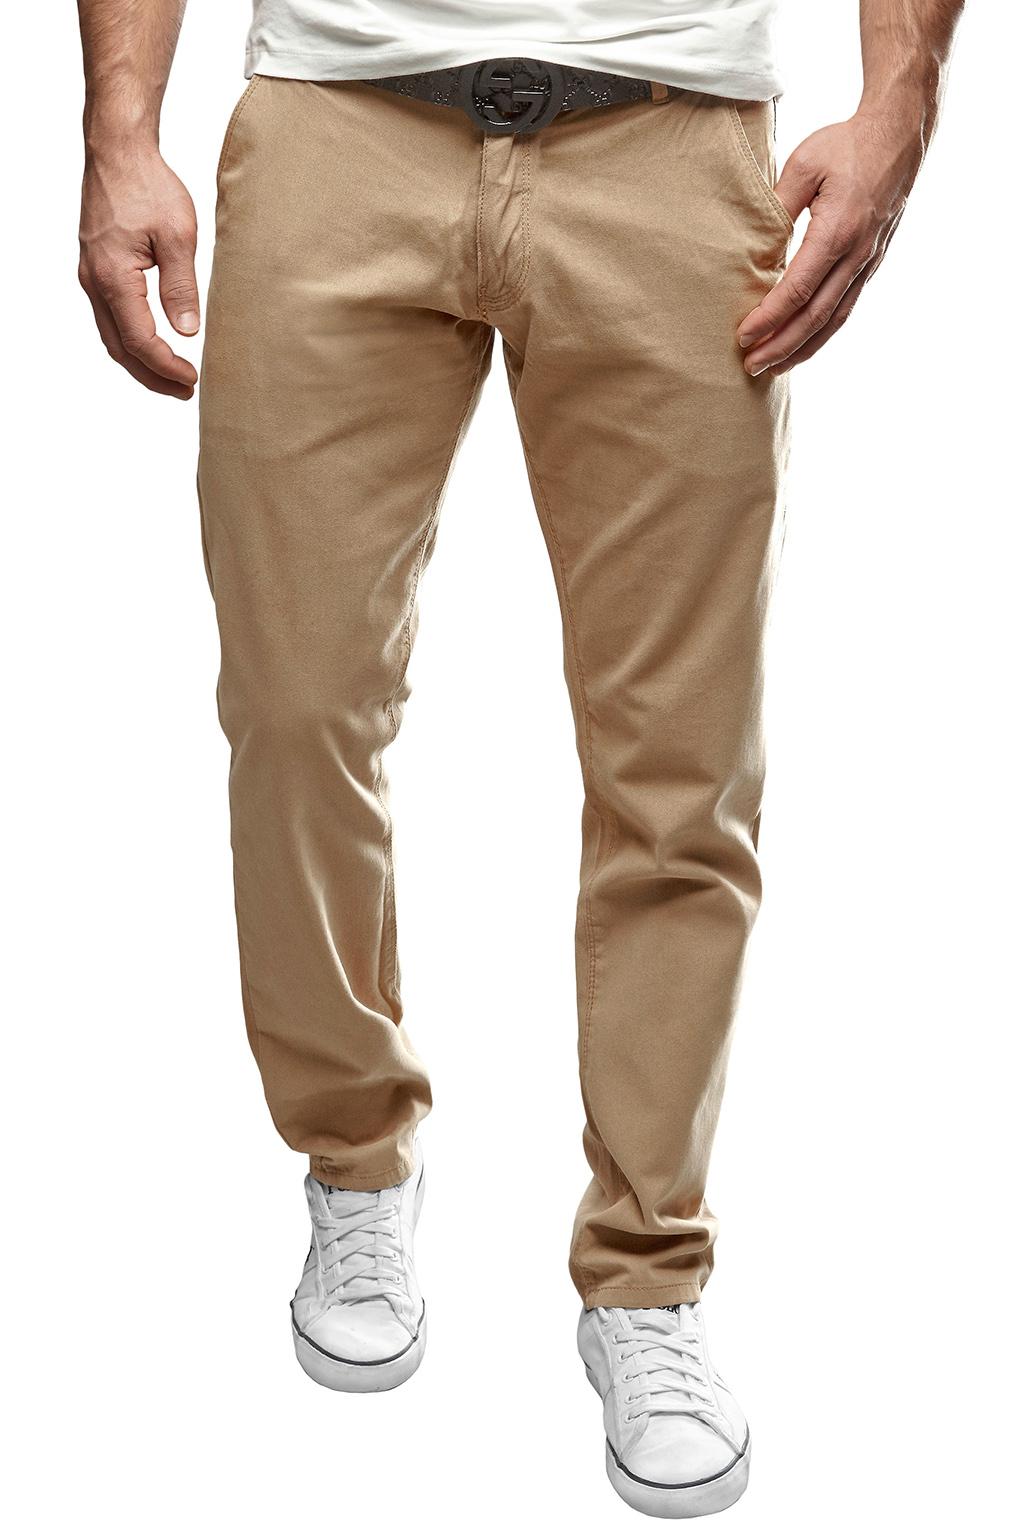 Merish men's chino trousers regular style jeans black/brown ...